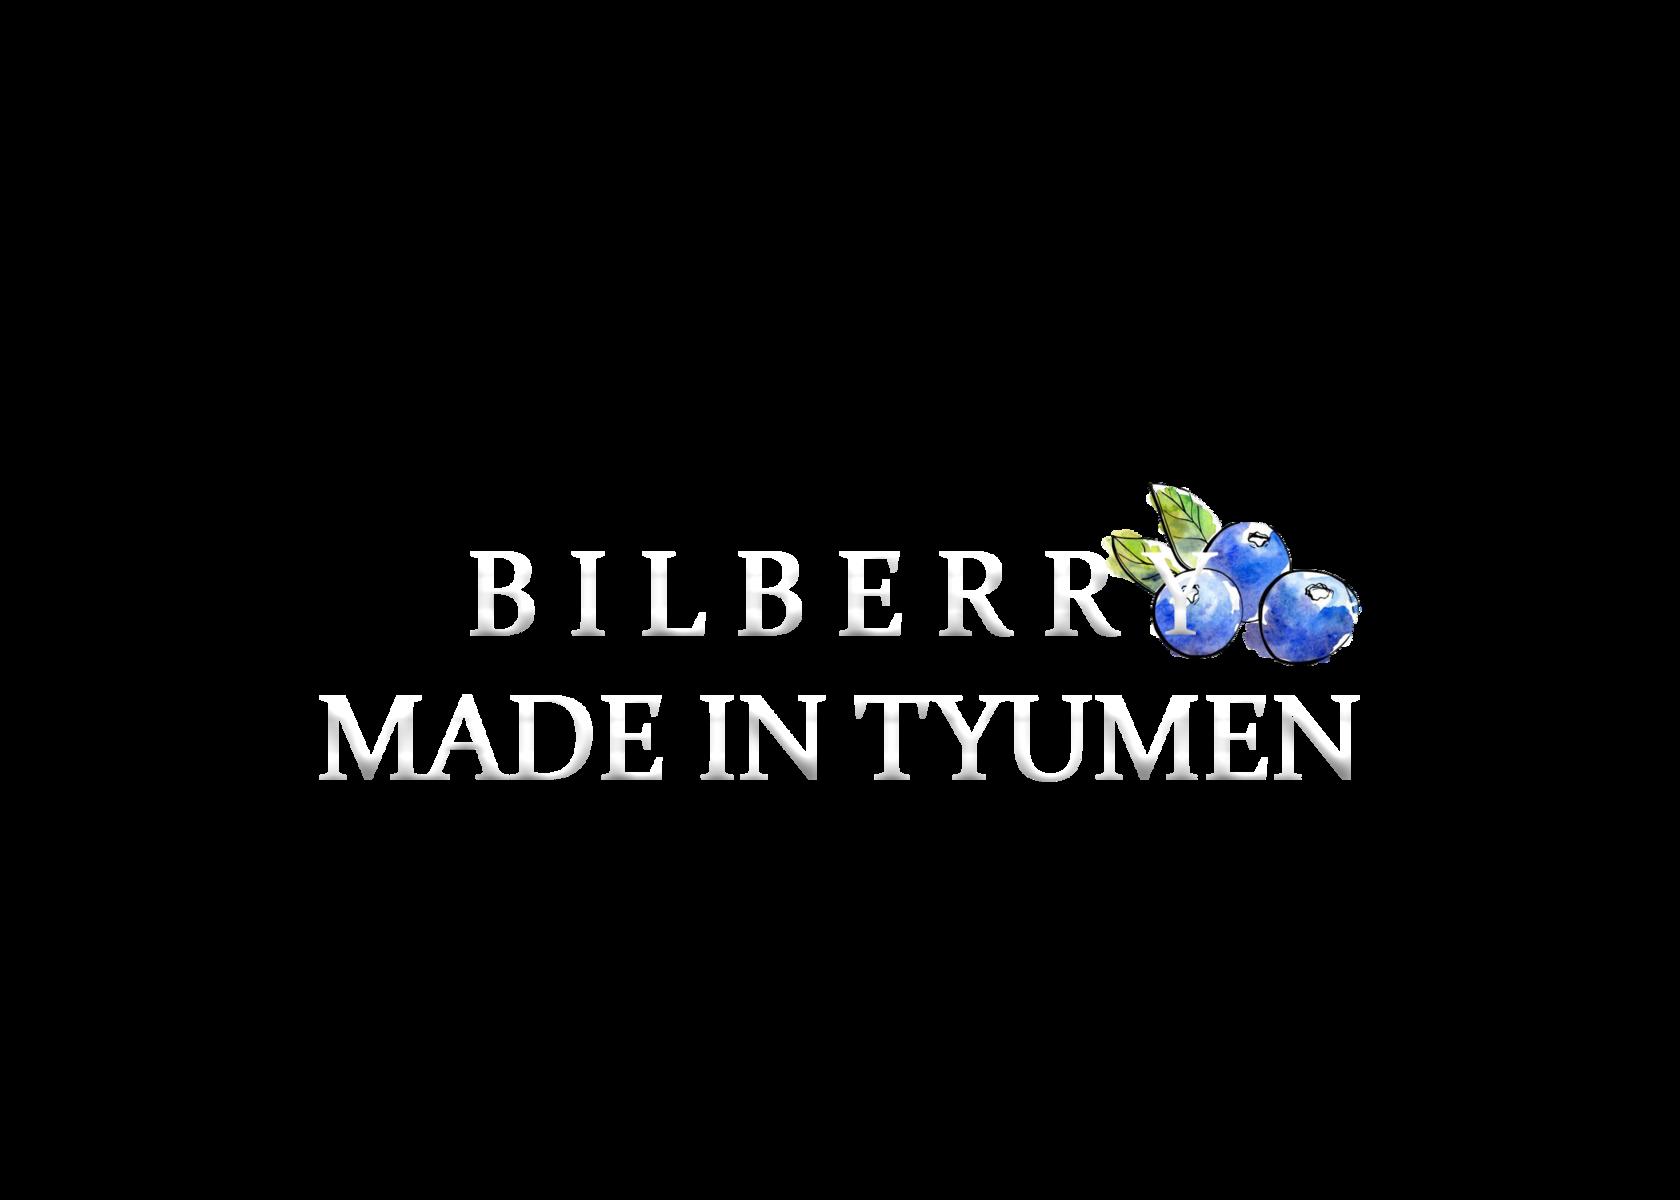 Студия театра и моды BILBERRY